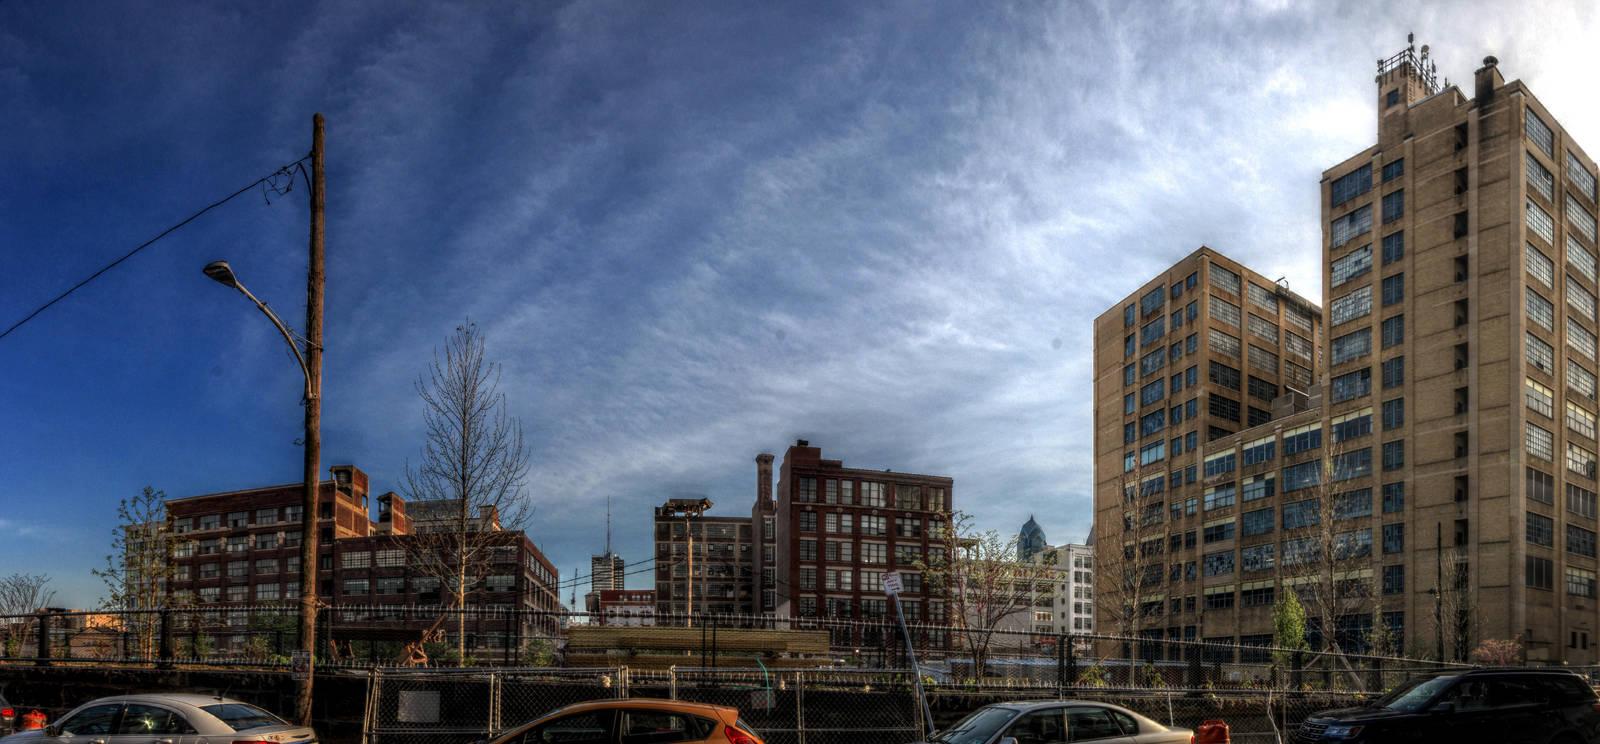 Panorama 3634 hdr pregamma 1 mantiuk06 contrast ma by bruhinb